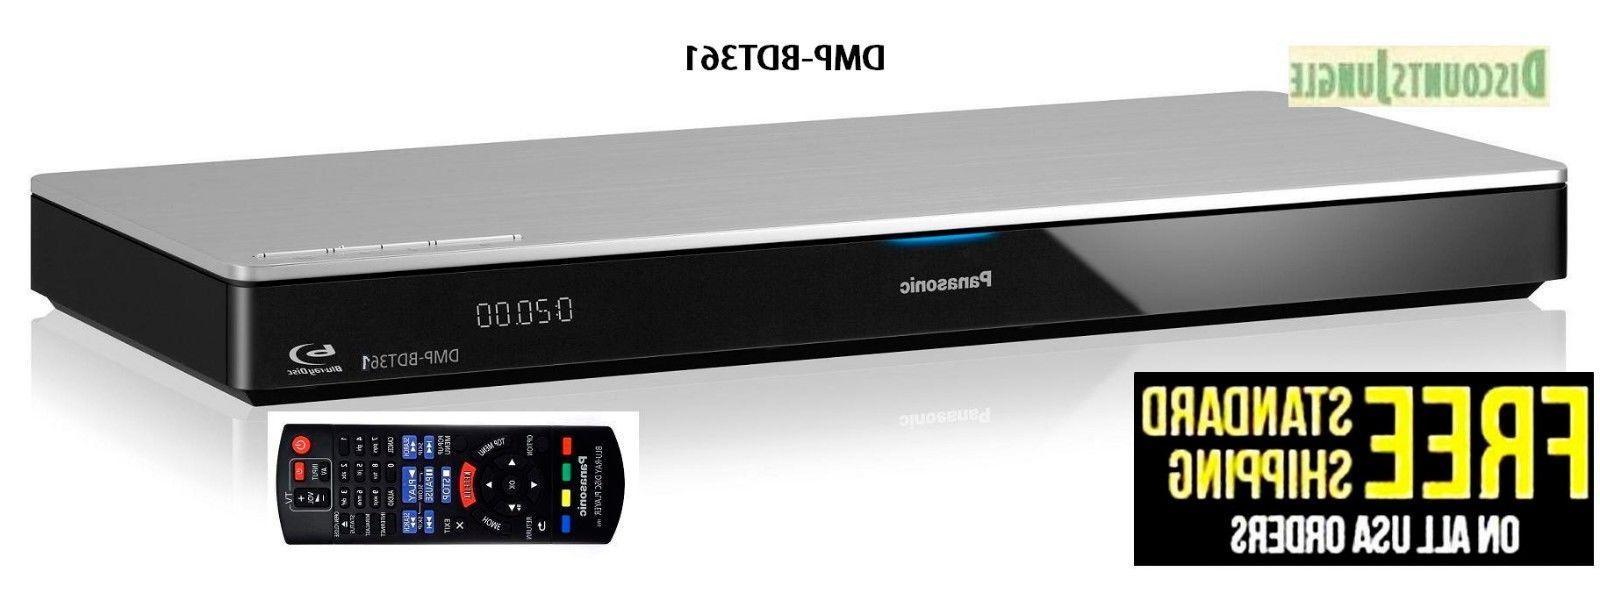 Panasonic DMP-BDT361 3D Smart Network Blu-Ray 4K HD Disc/DVD